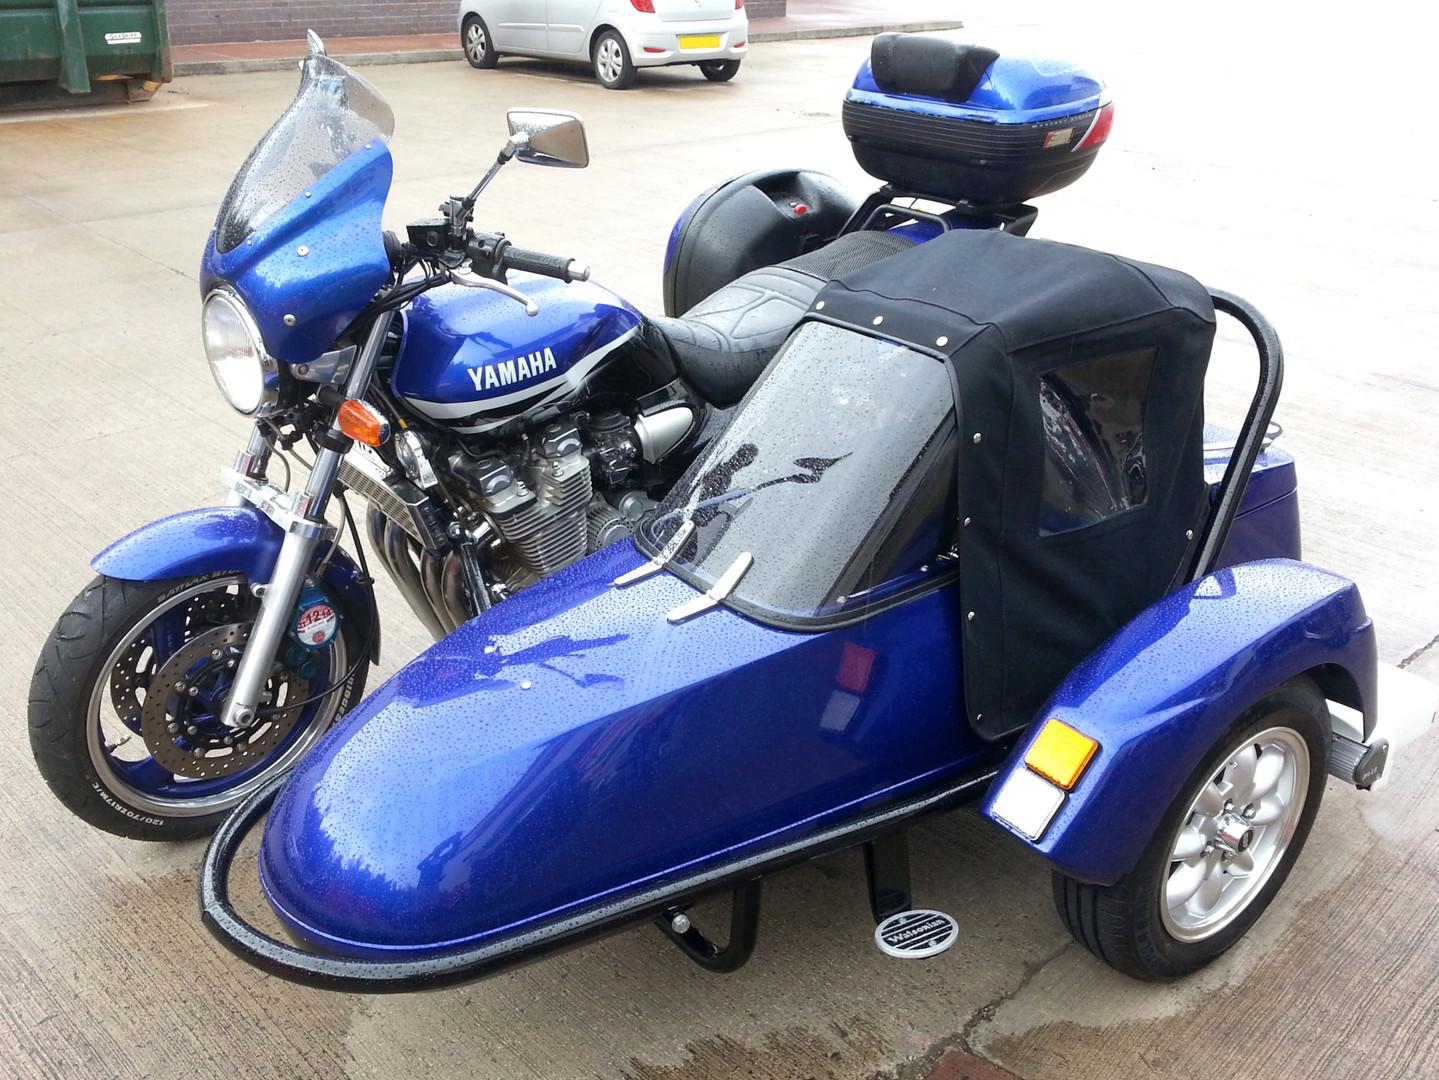 Gusto Motorbikes_Yamaha XJR 1300 Sidecar Combination